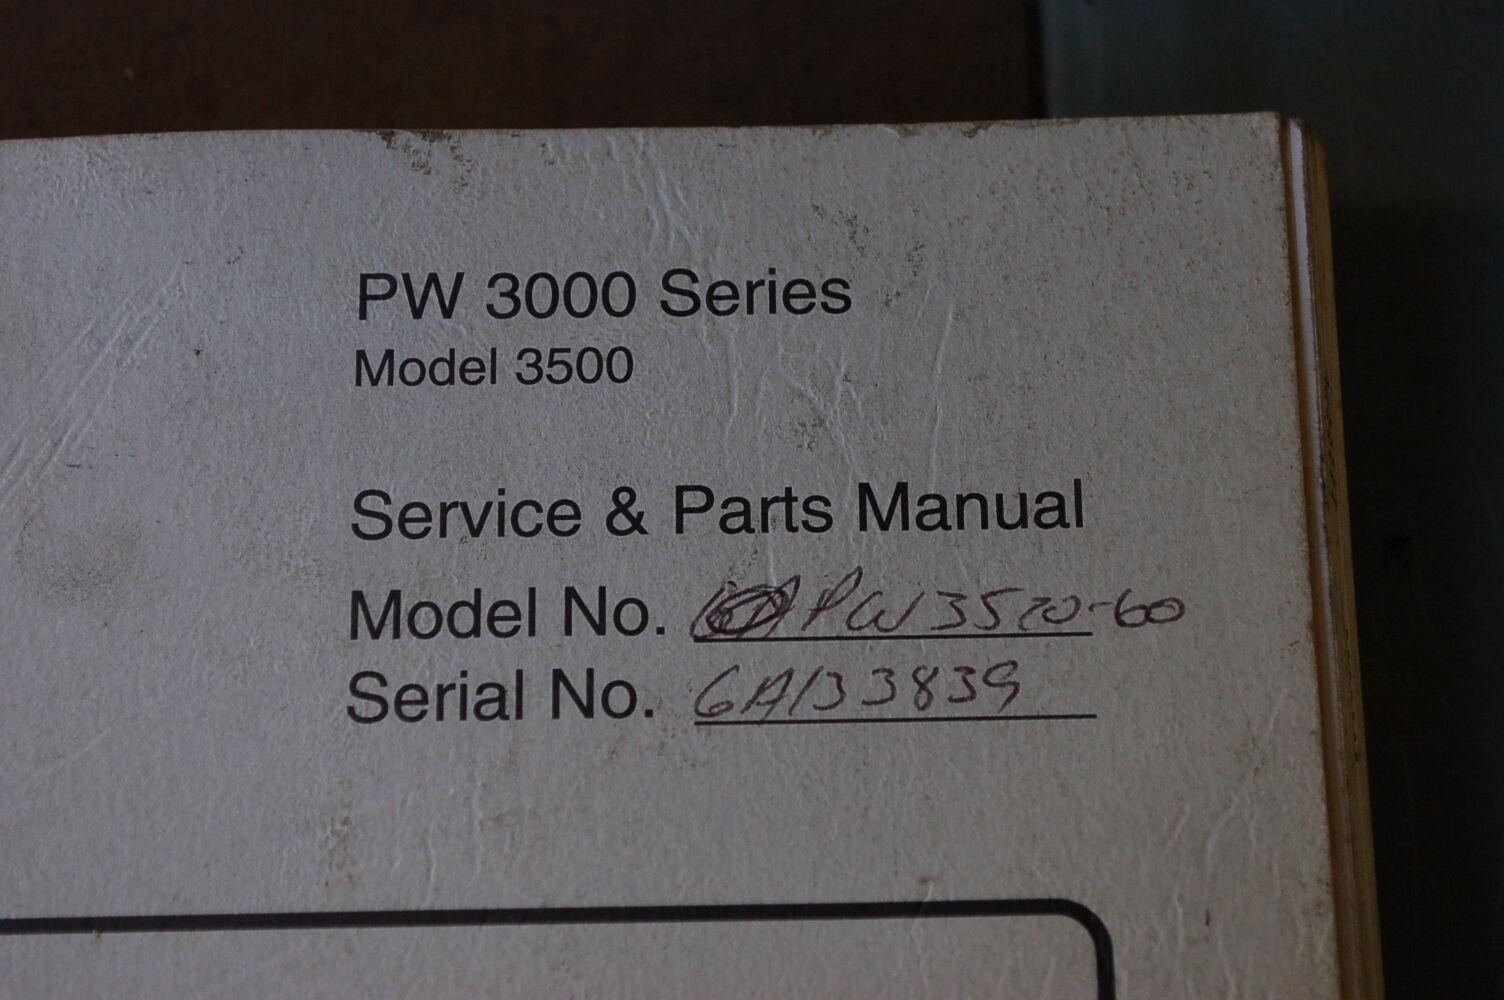 Crown 35rrtt Manual 19972000 Honda Crv Electrical Troubleshooting Original Array Rh Elzplorers De